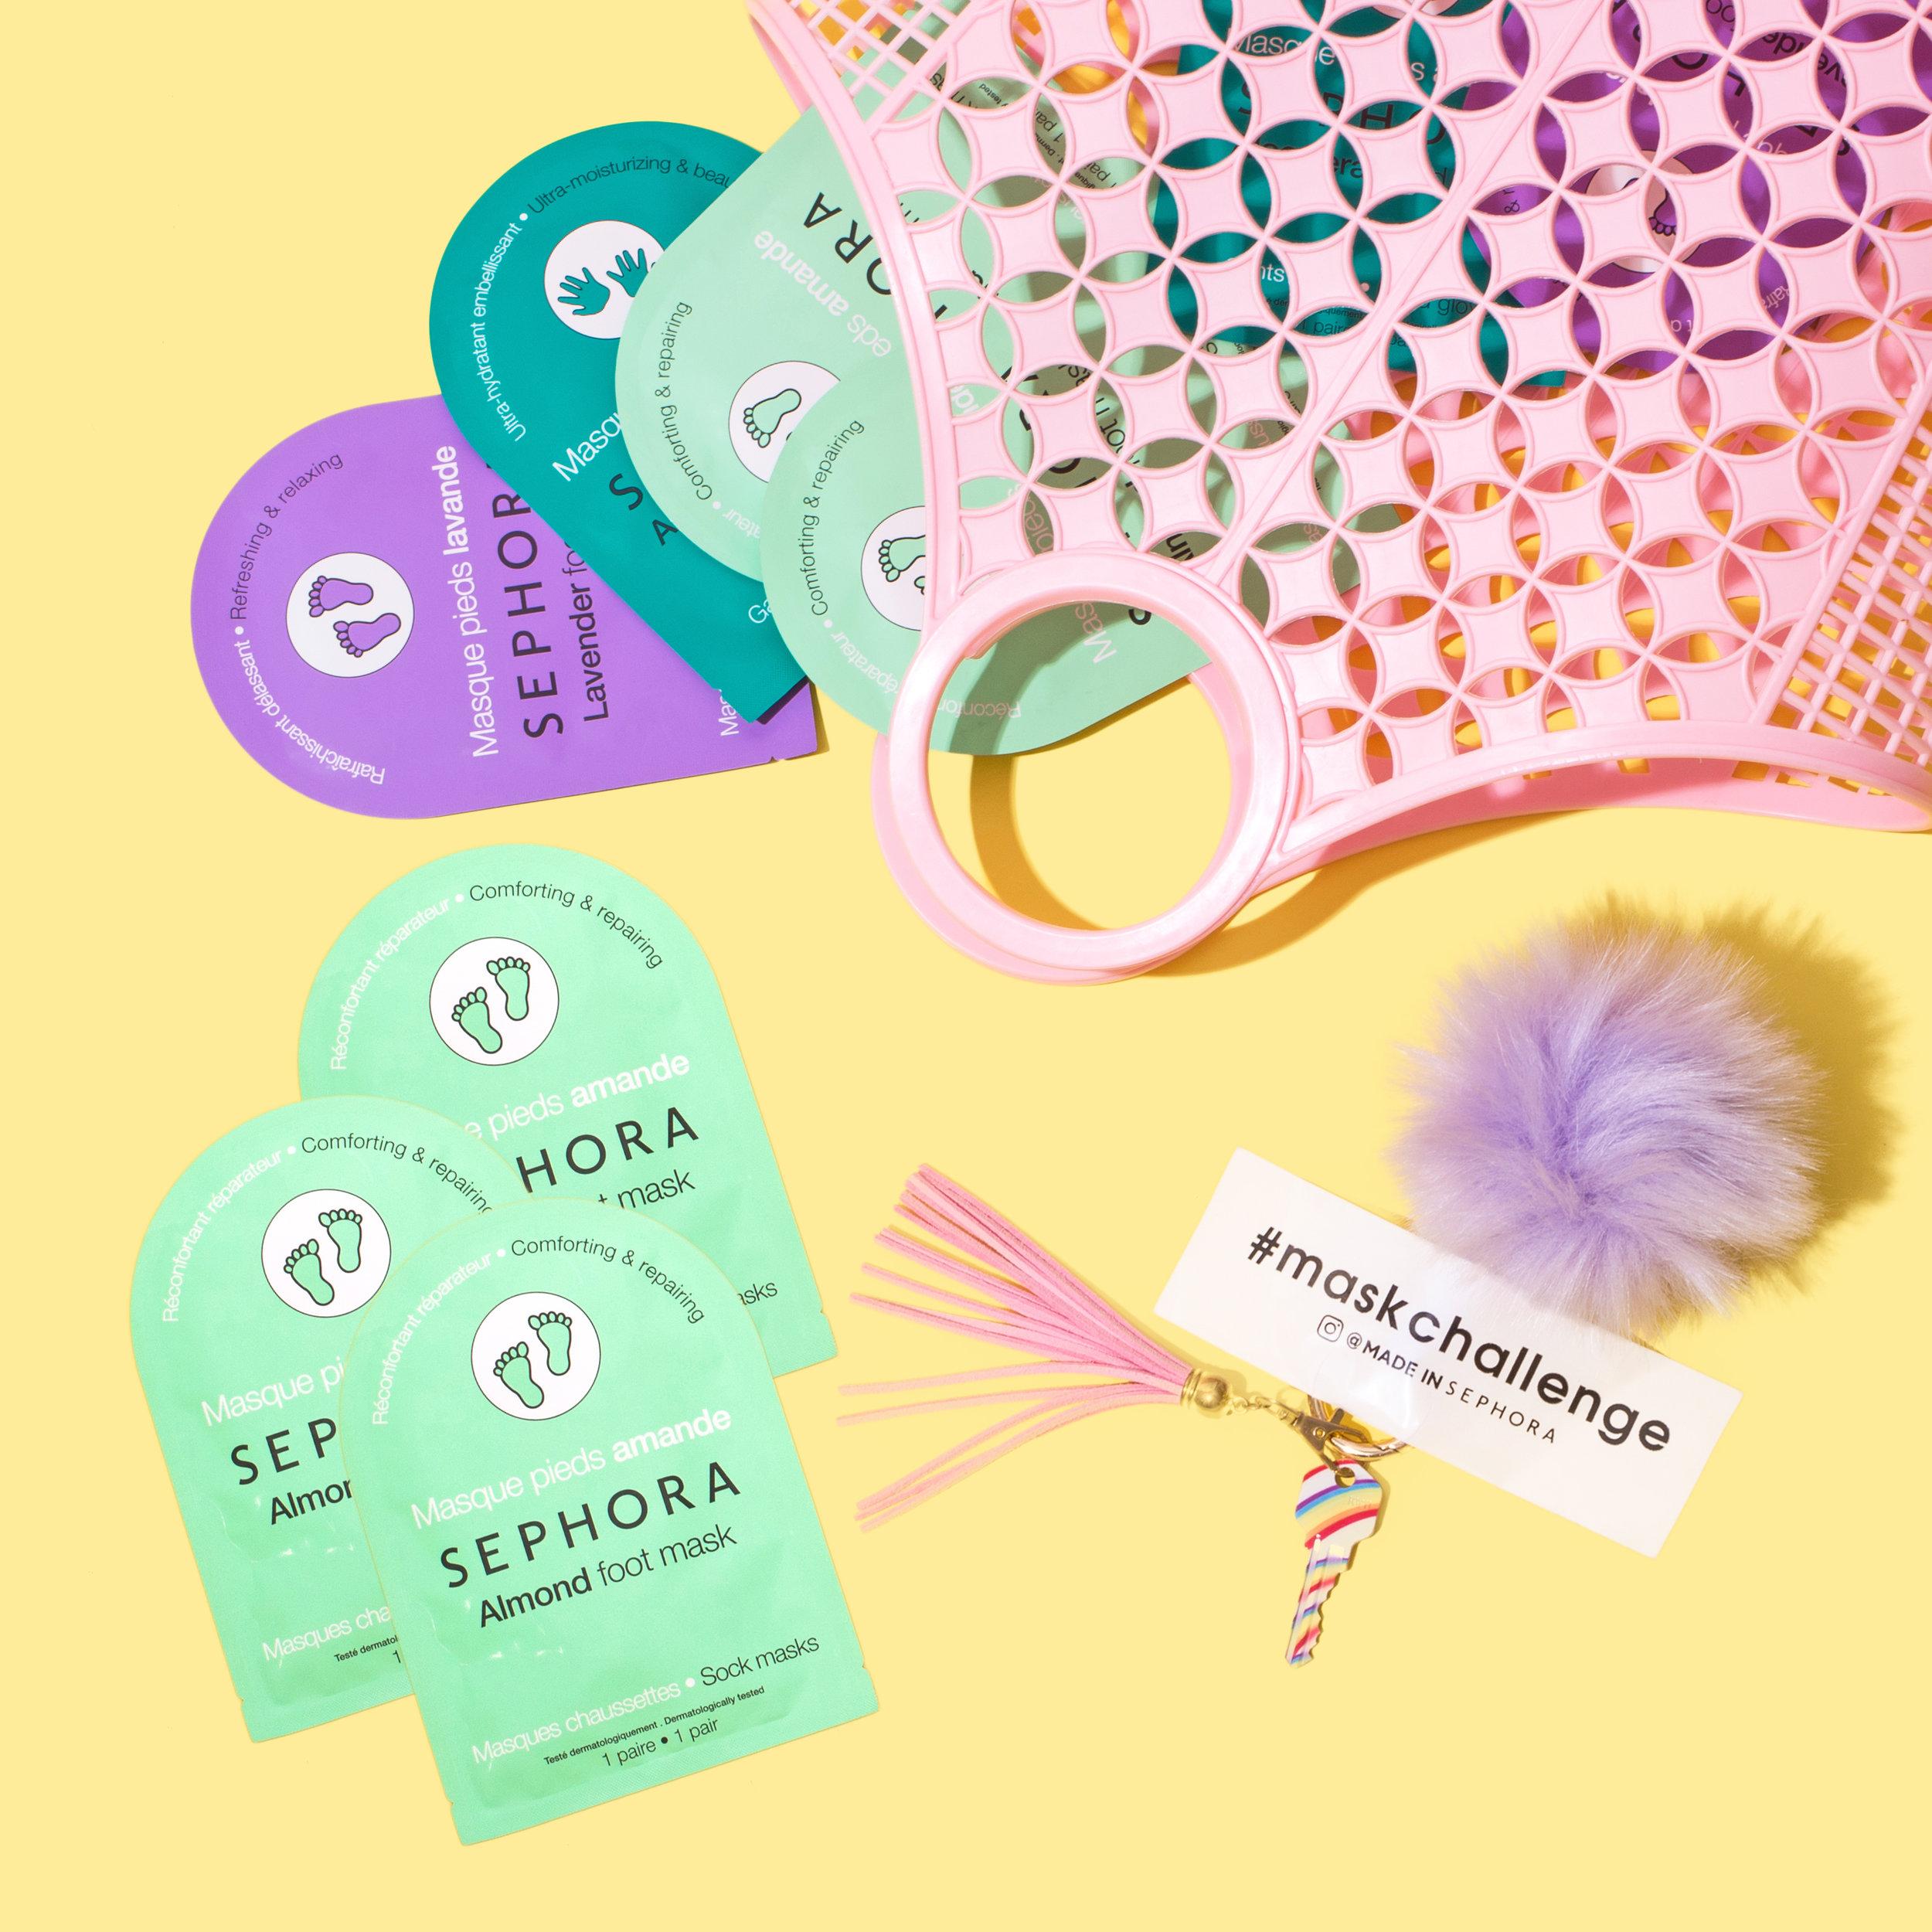 Sephora Bag Mask Challenge 1D.jpg